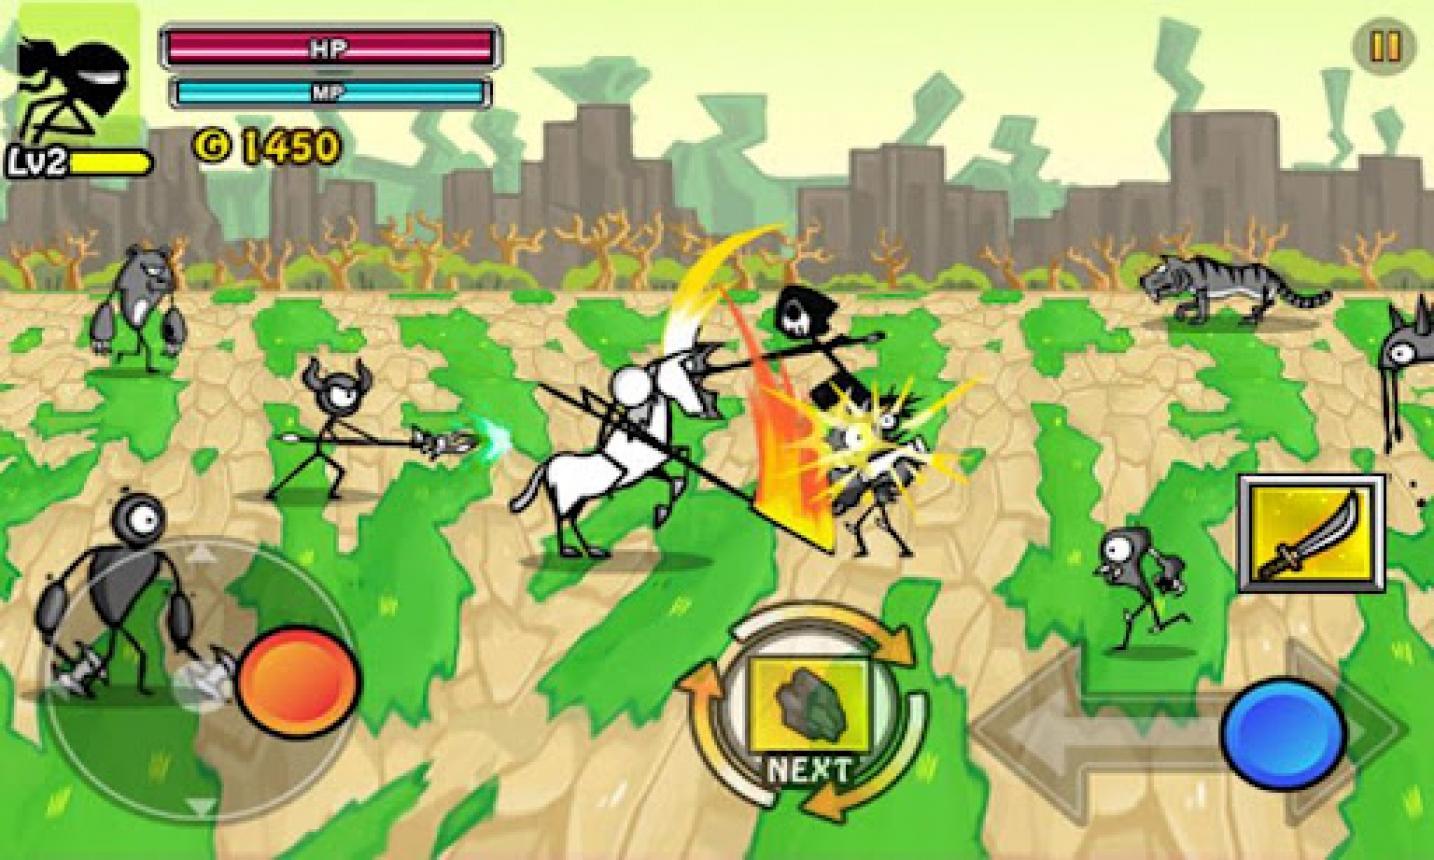 Cartoon Wars: Blade Mod Apk | HackApkCheats.com